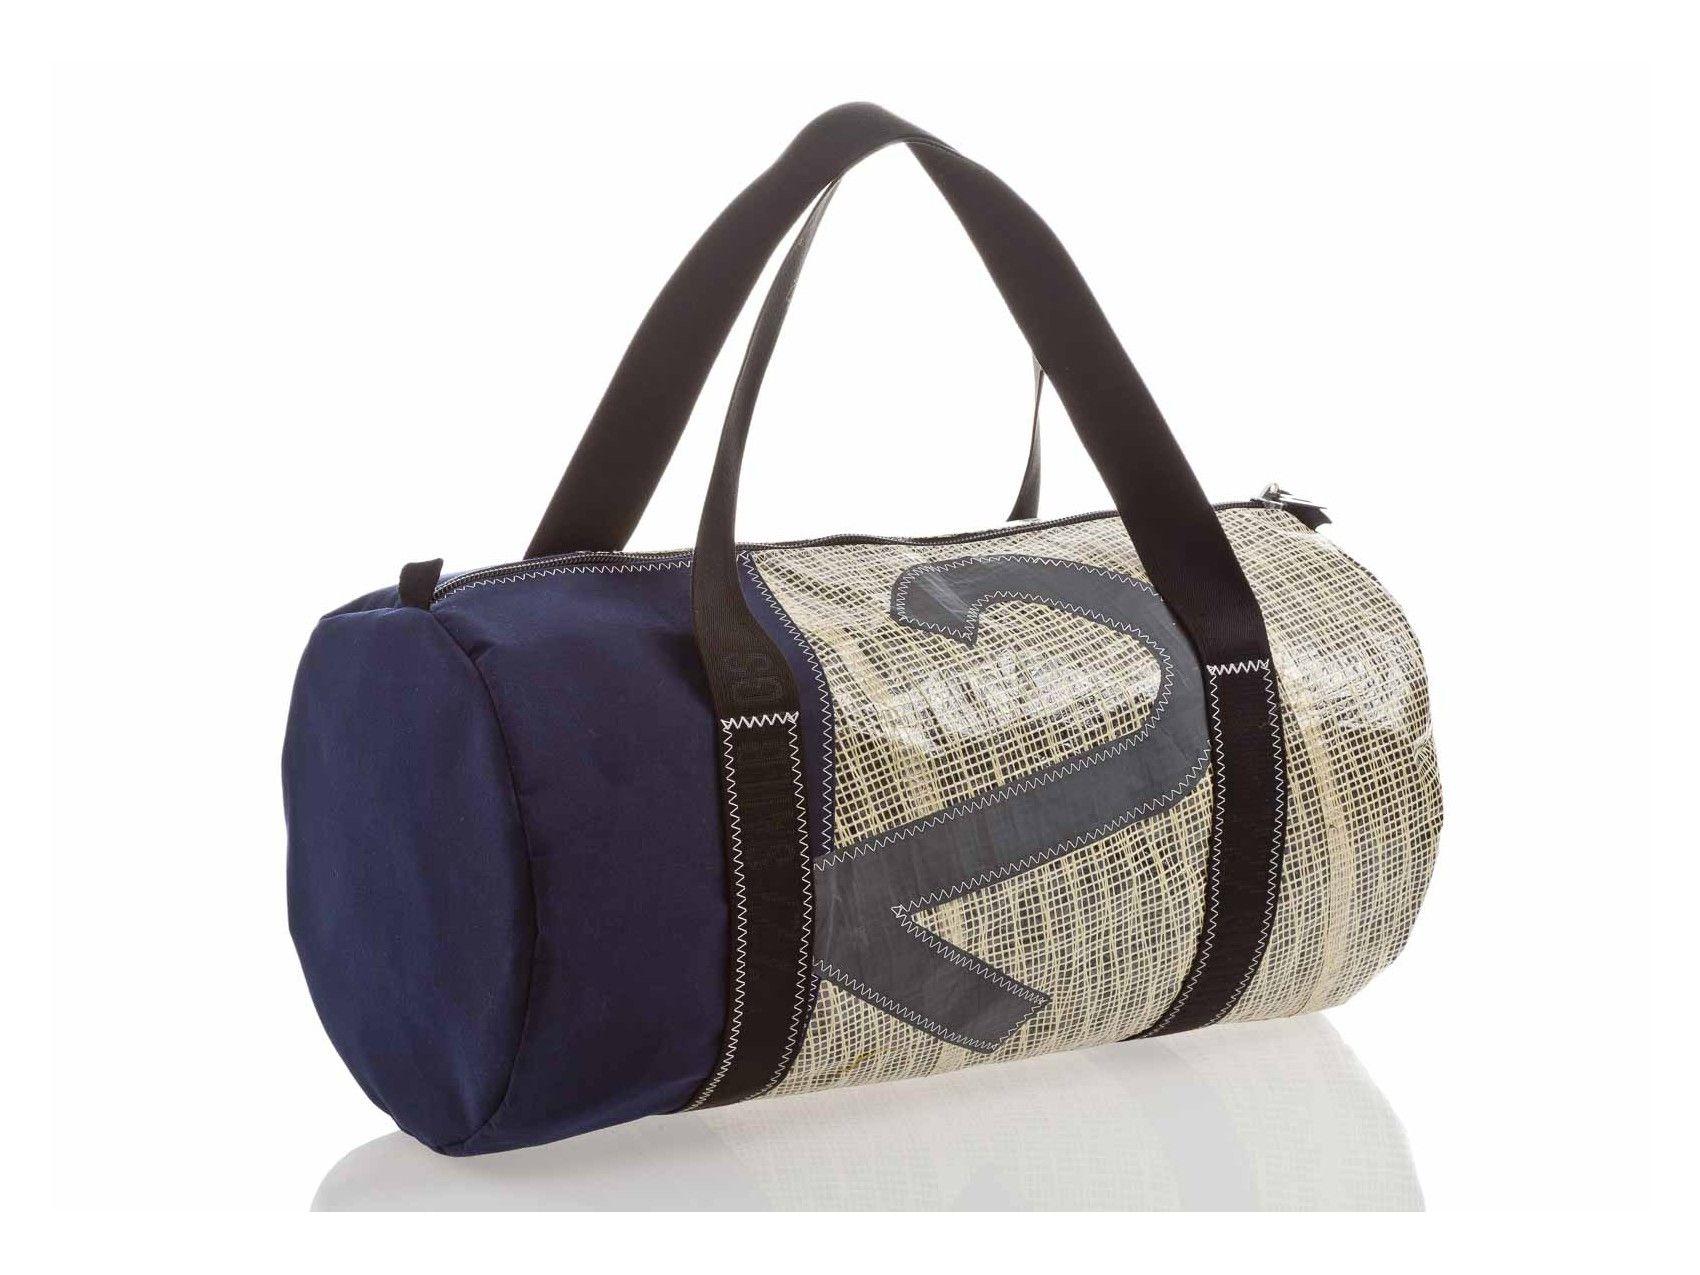 b7adf4feebf6 Travel bag in recycled sailcloth